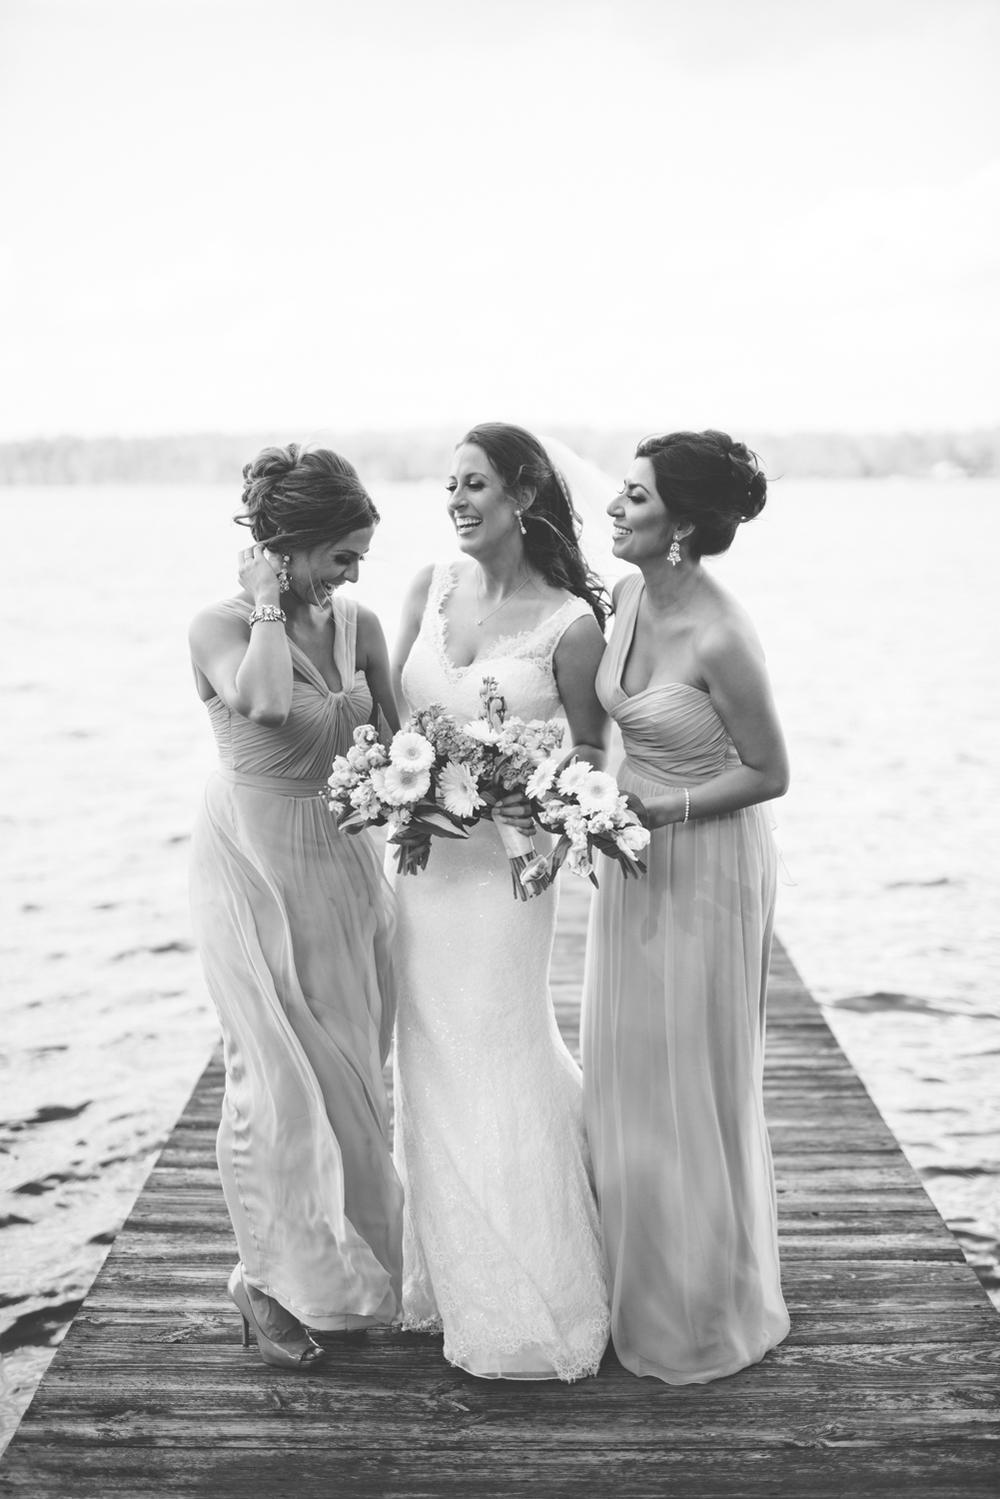 celebrationsatthereservoir-wedding-virginiaweddingphotographer-19.jpg